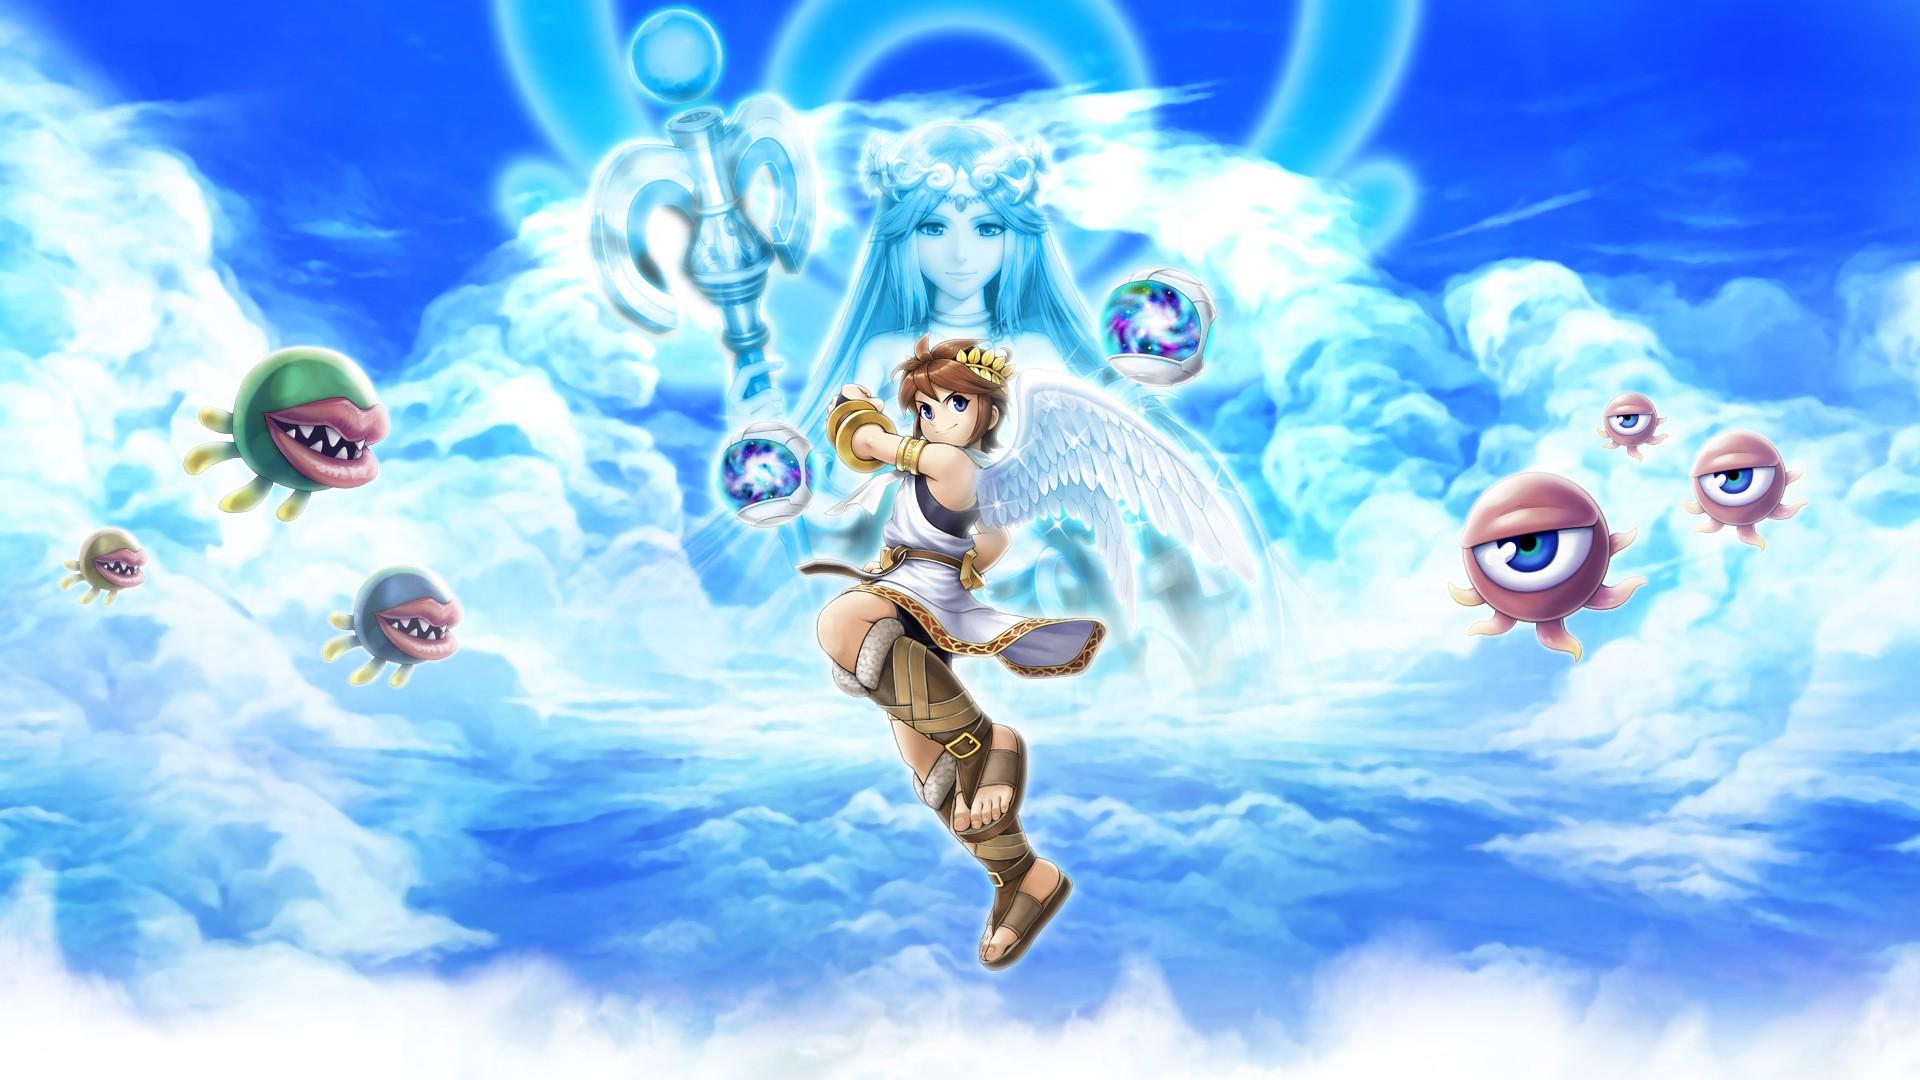 3 Kid Icarus Uprising HD Wallpapers